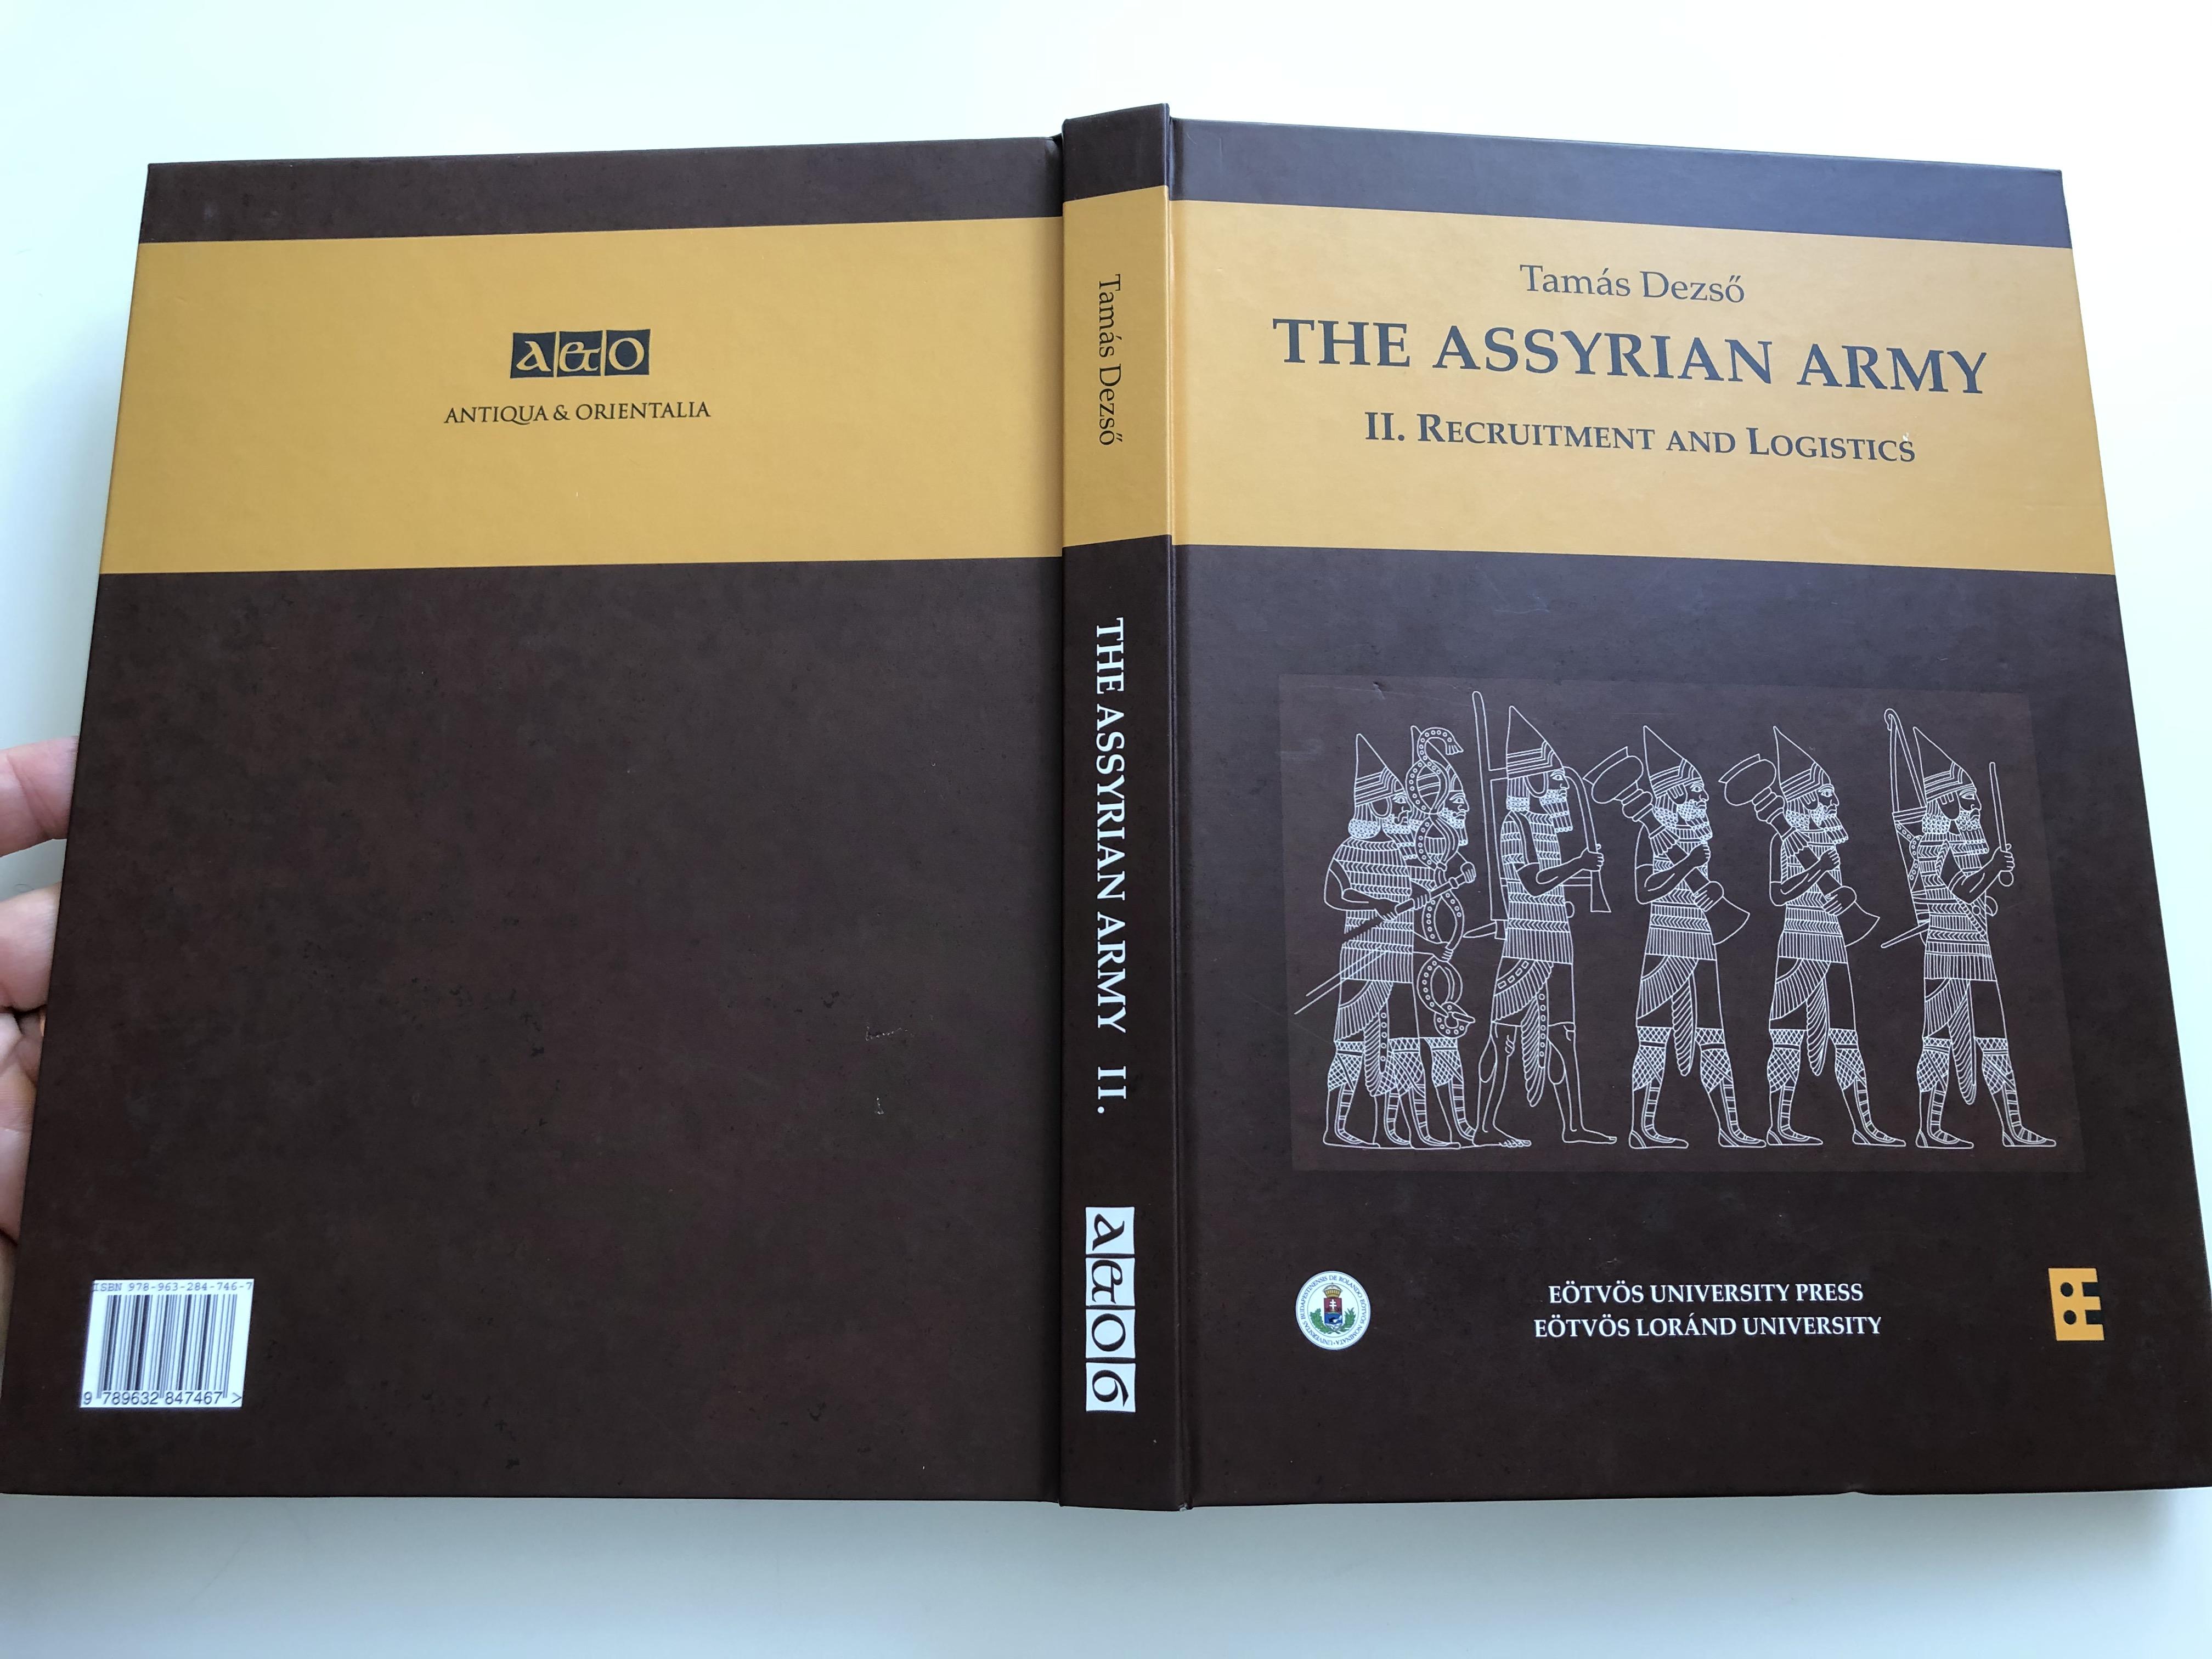 the-assyrian-army-ii-ii.-recruitment-and-logistics-author-dezs-tam-s-20.jpg